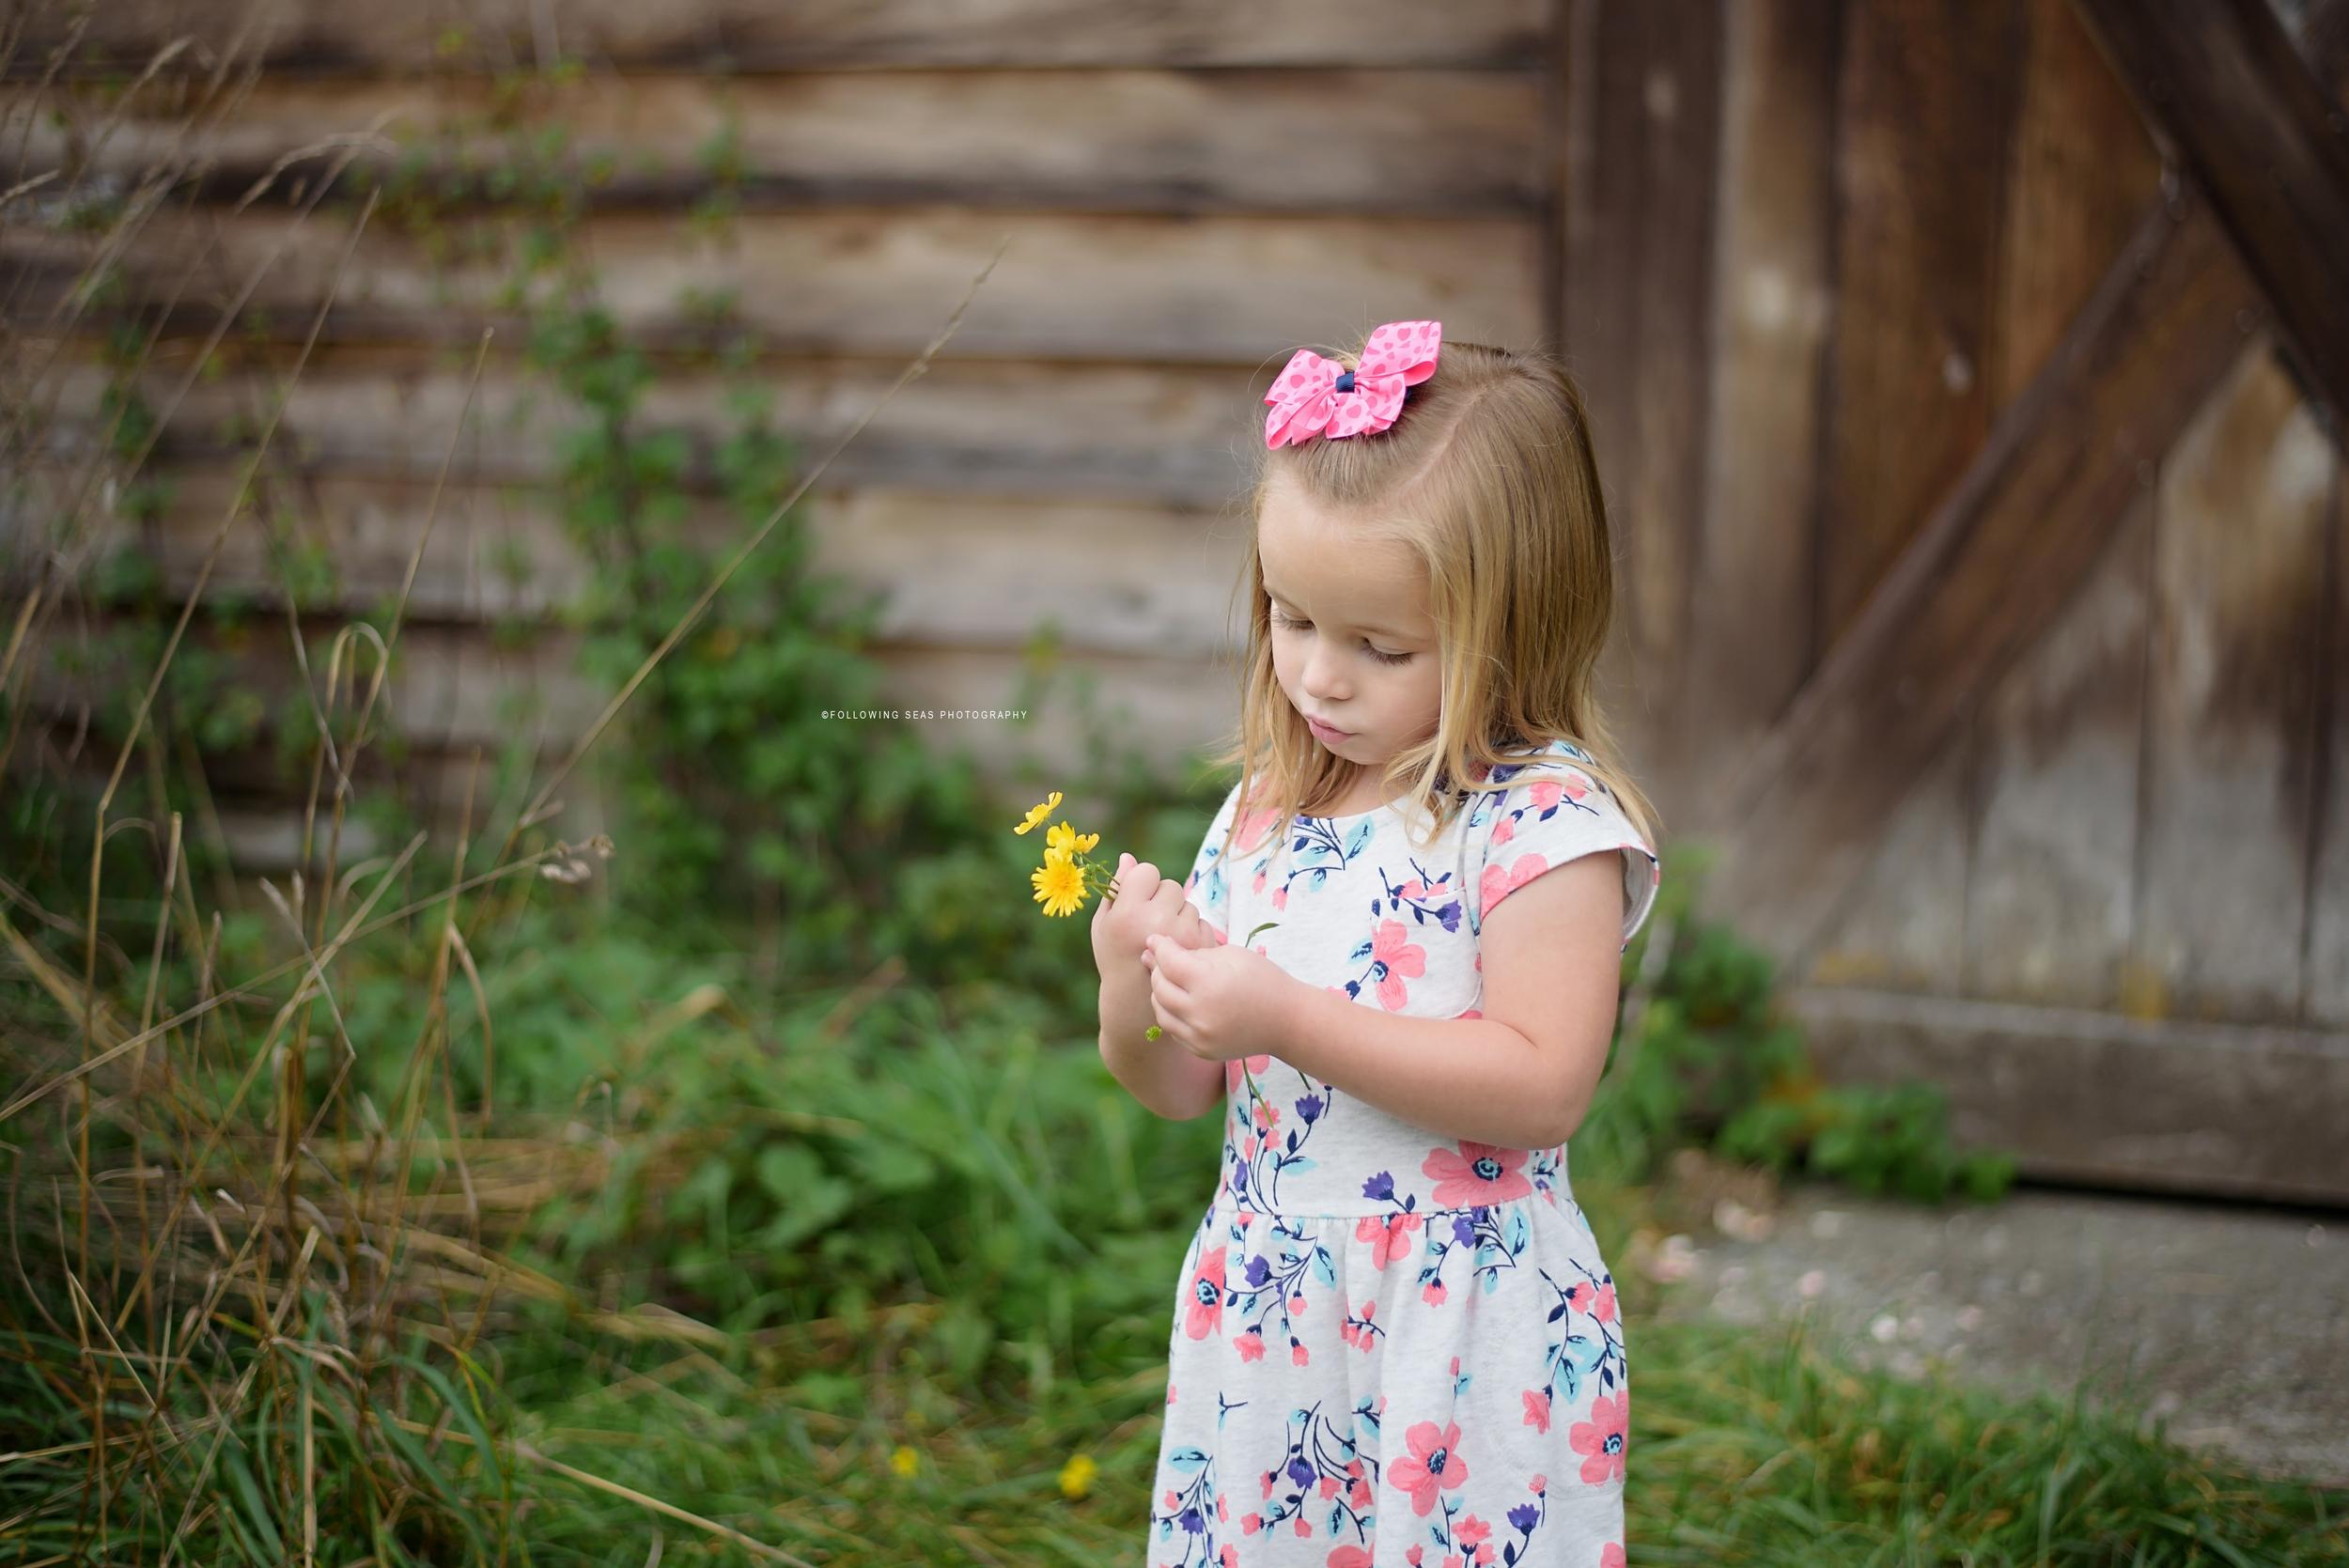 Bremerton-Family-Photographer-Following-Seas-Photography-31 copy.jpg